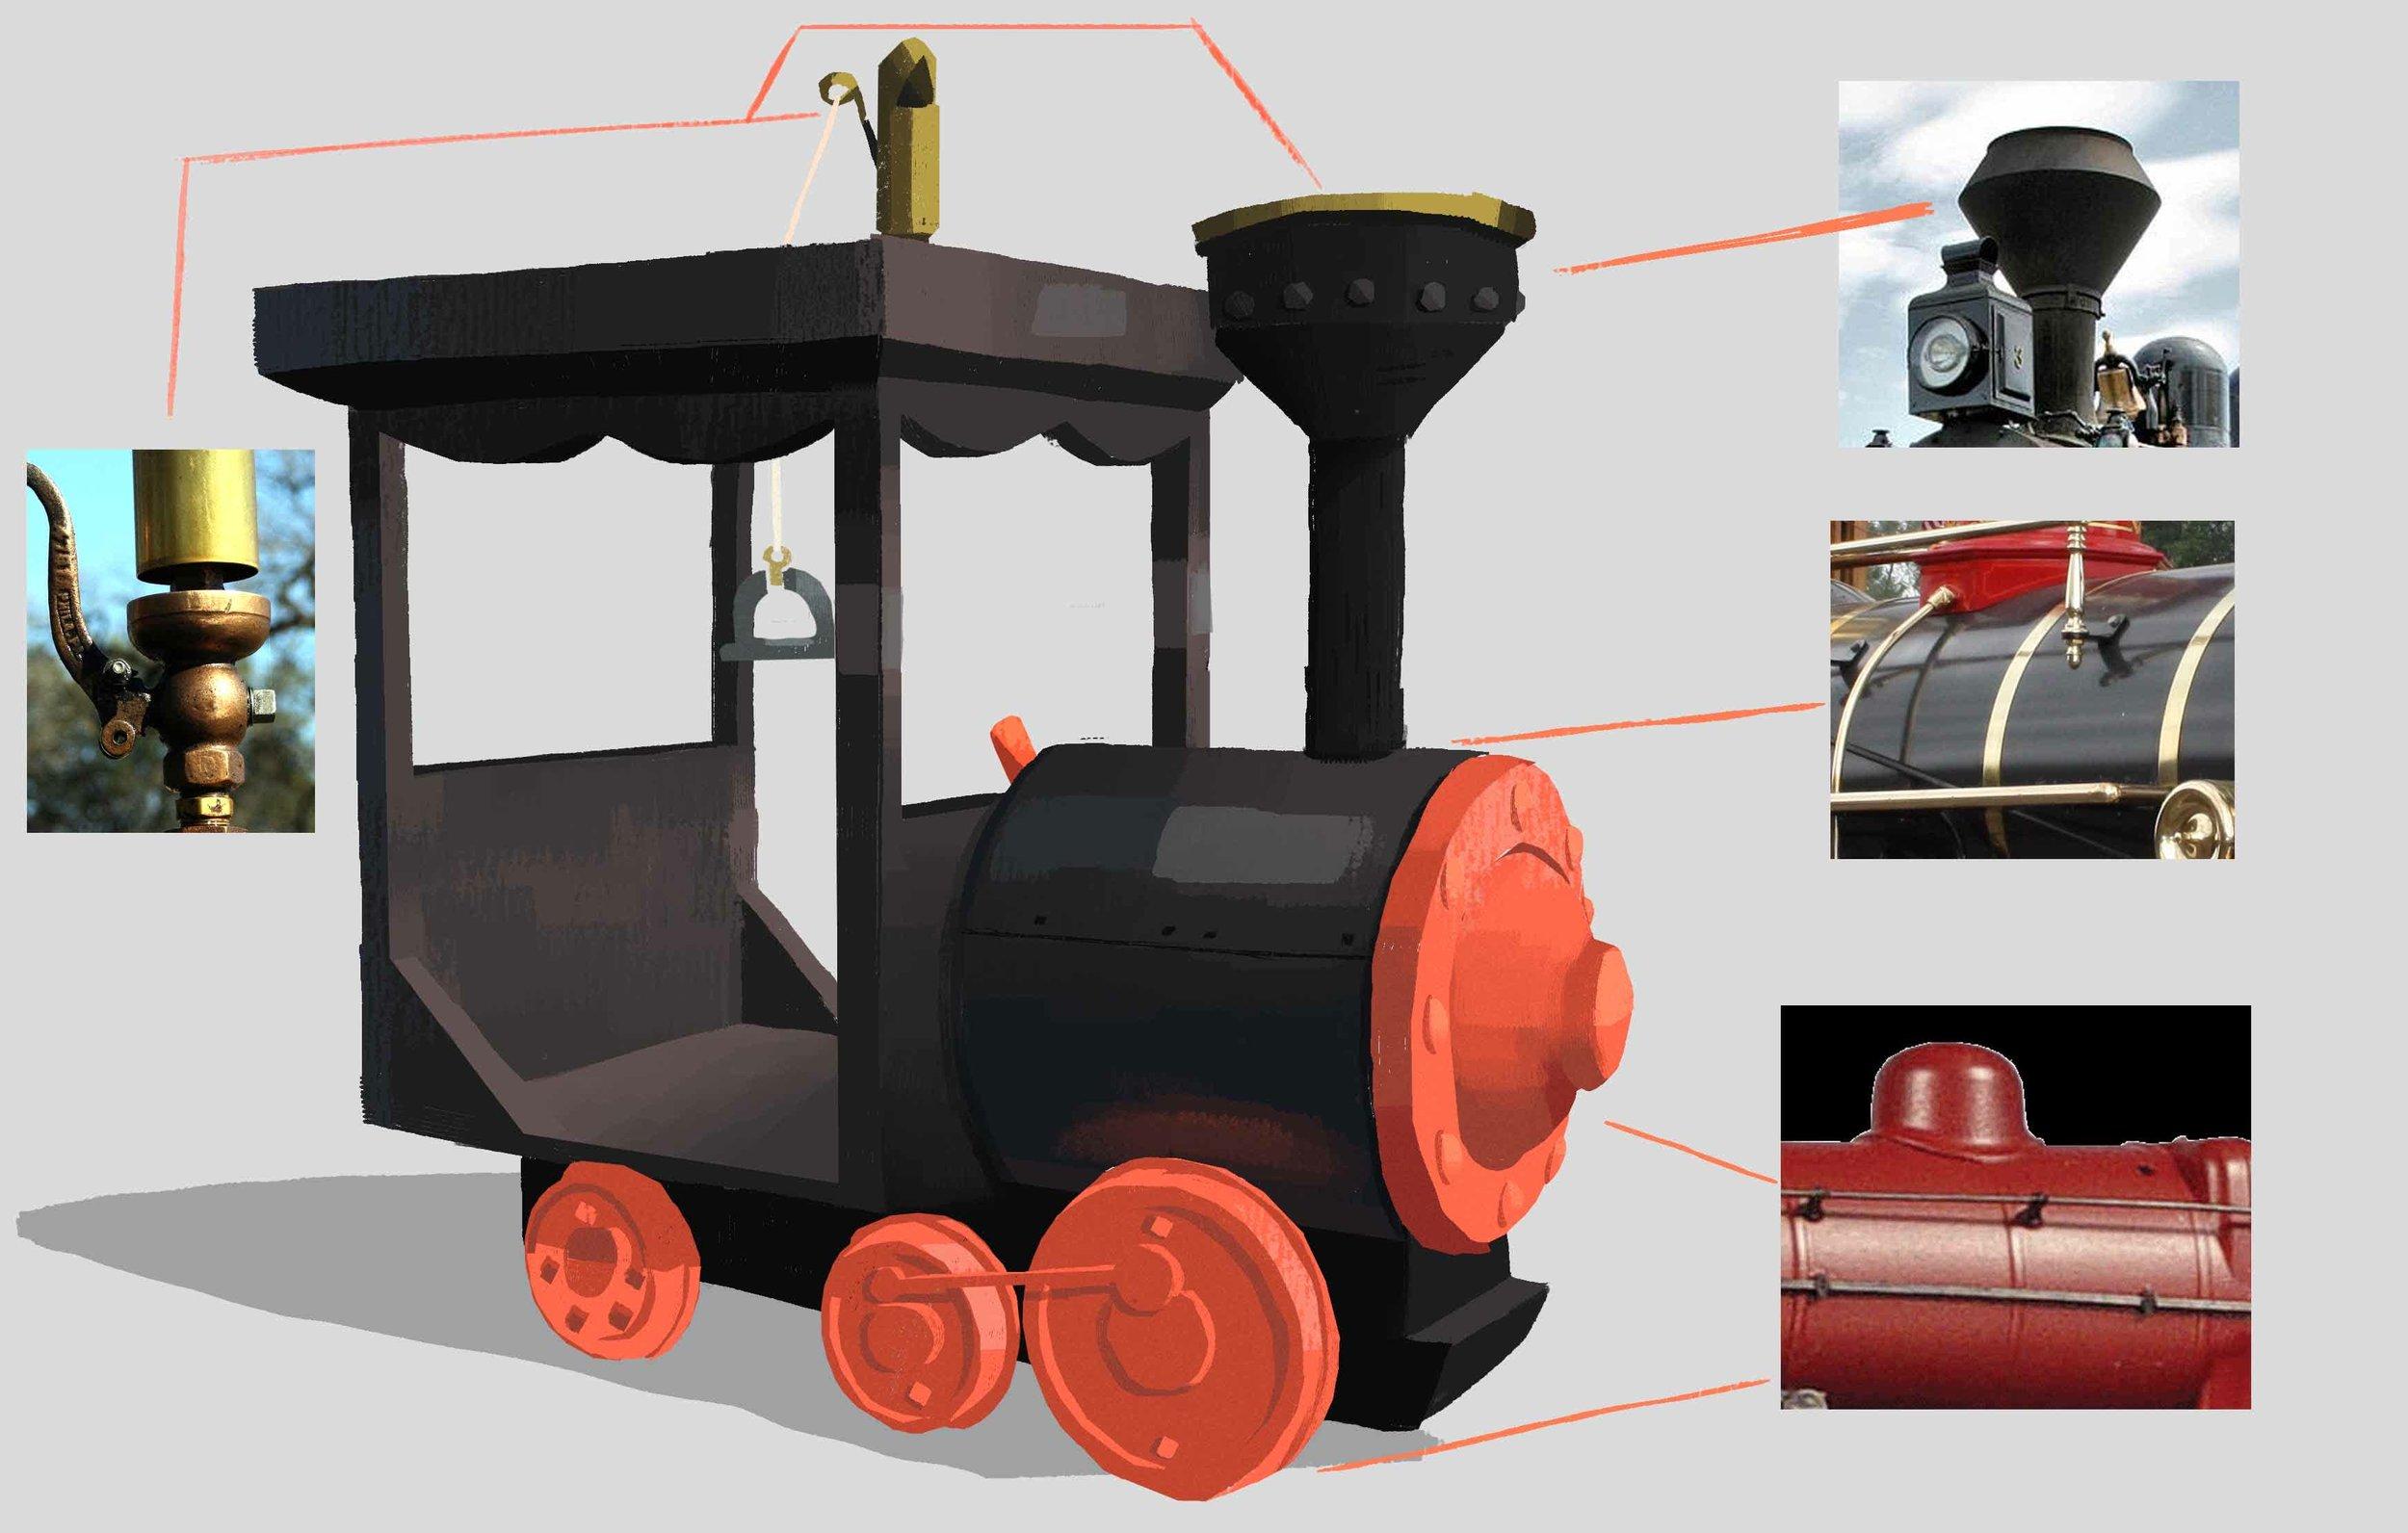 PROPS_Locomotive_DESIGN_PAFHANNATrainTExtures.v000_thumb.jpg